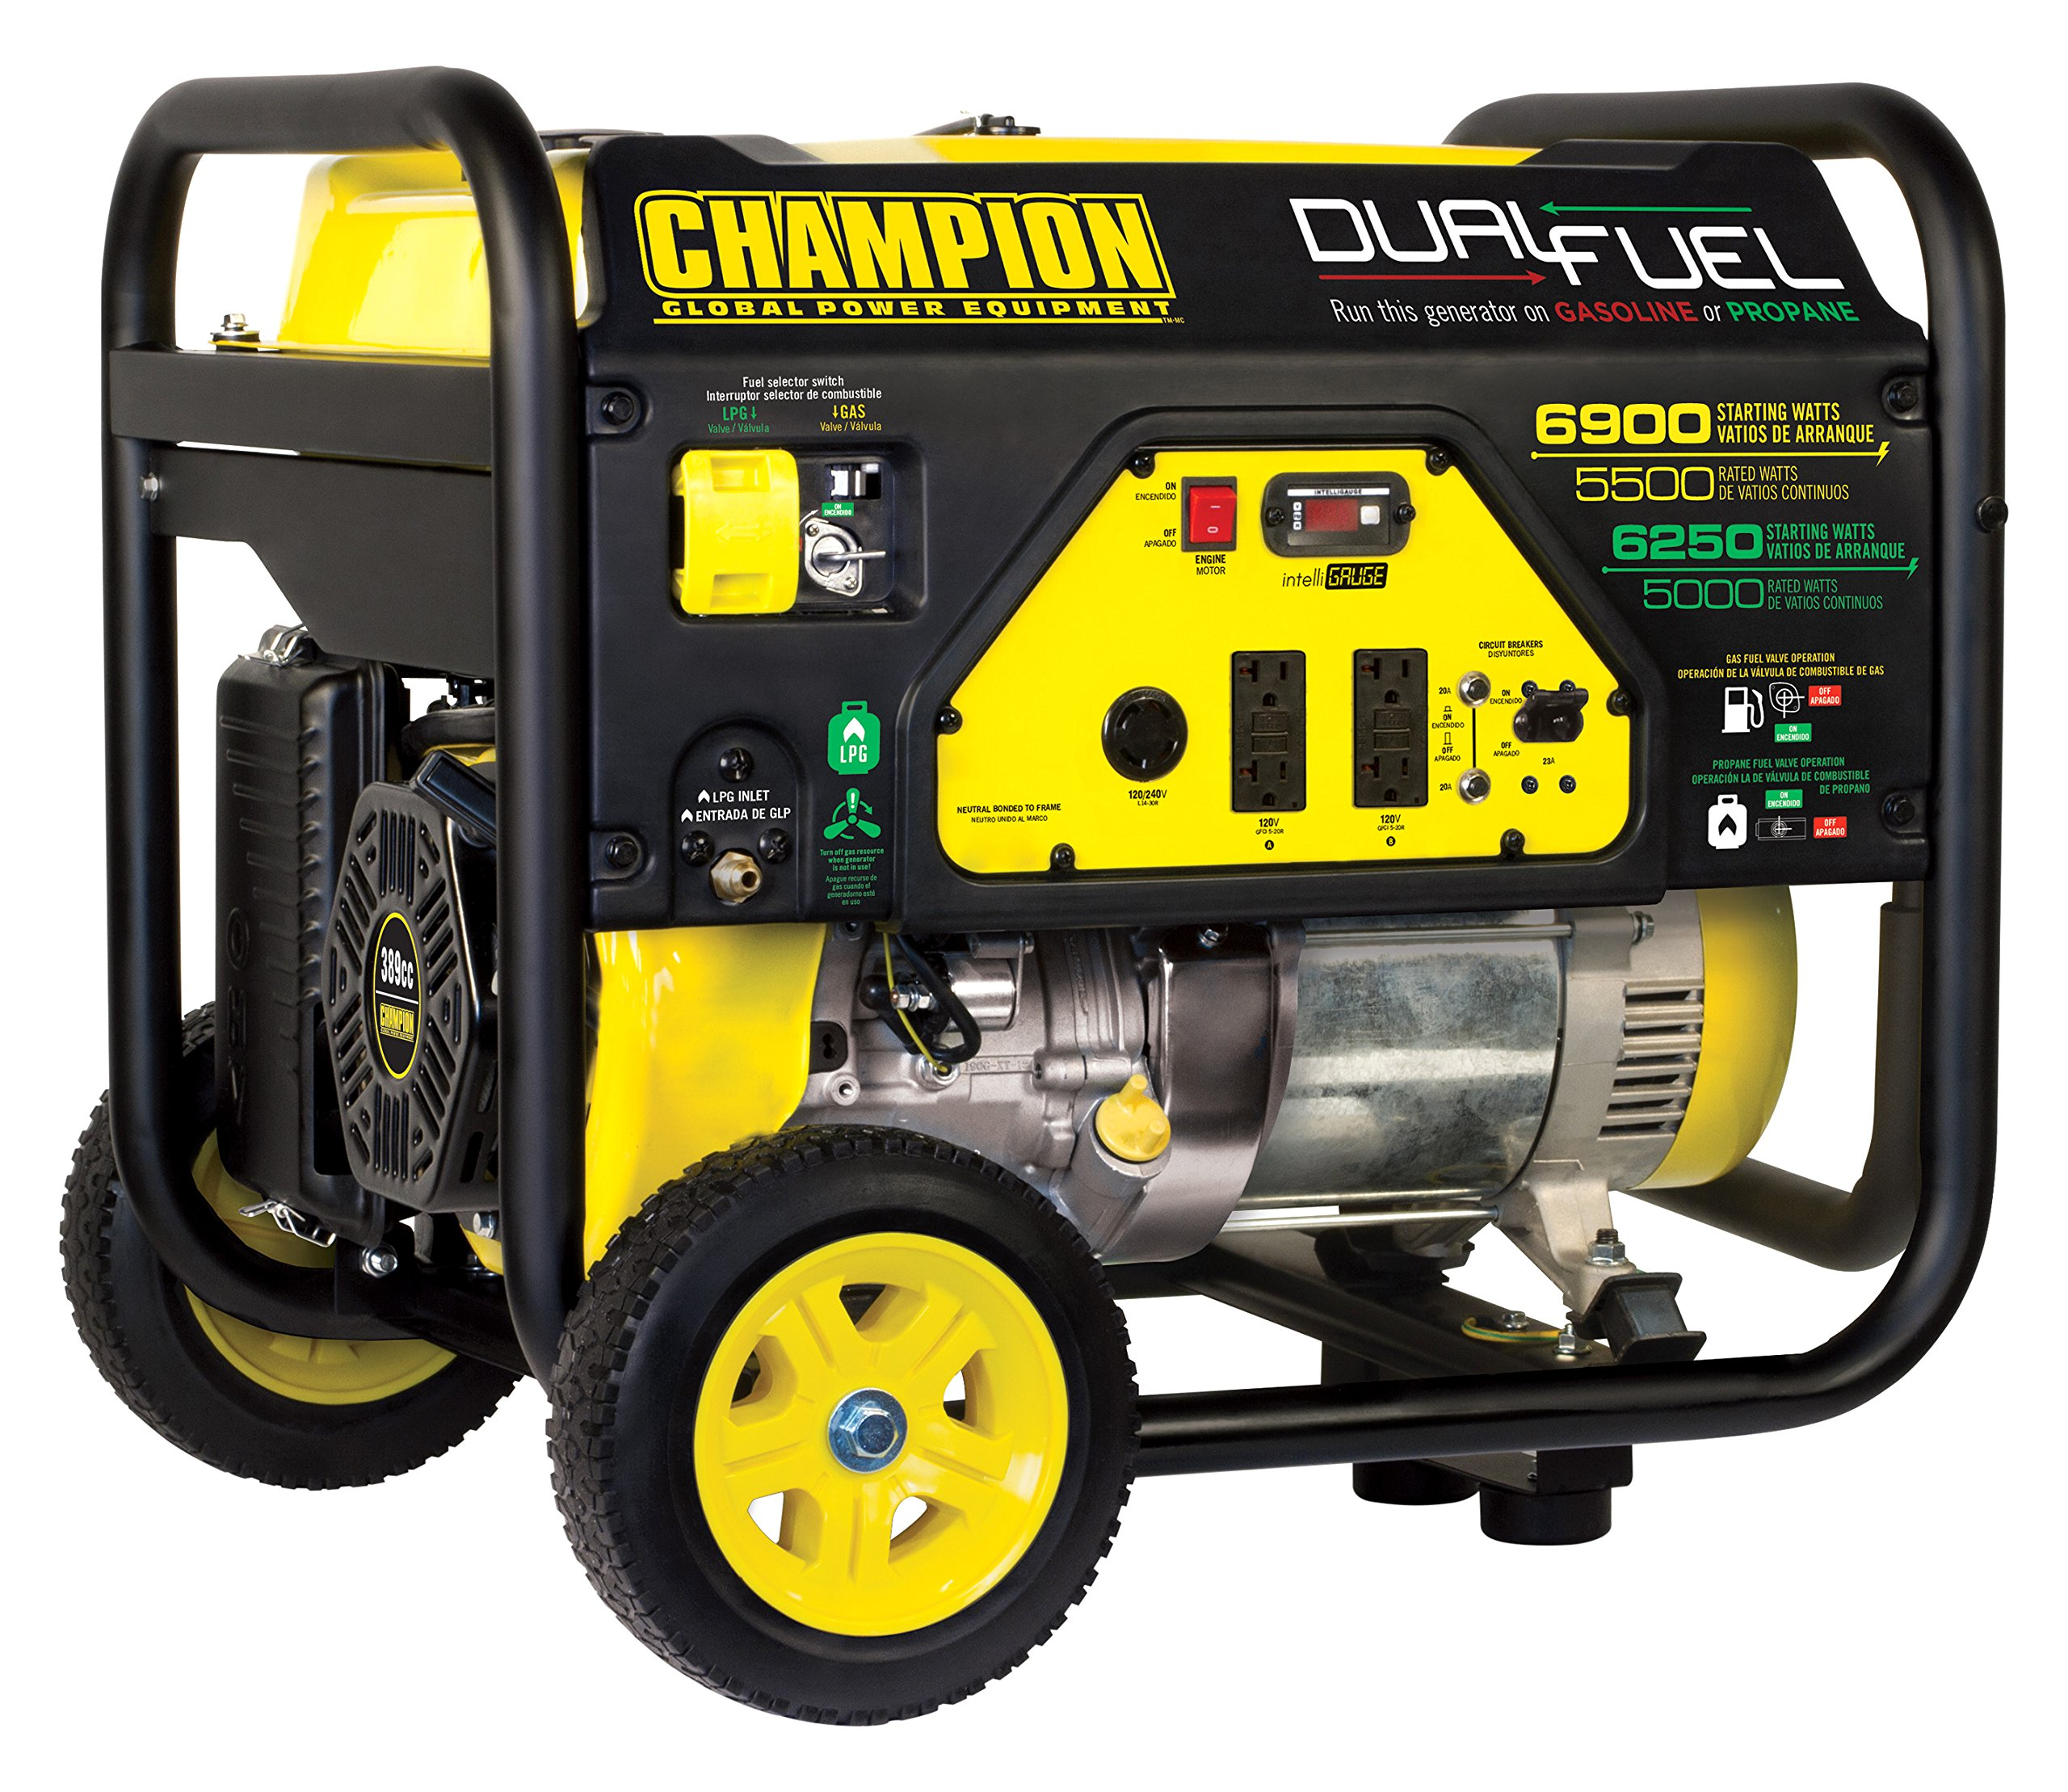 Champion 5500-Watt Dual Fuel Portable Generator with Wheel Kit